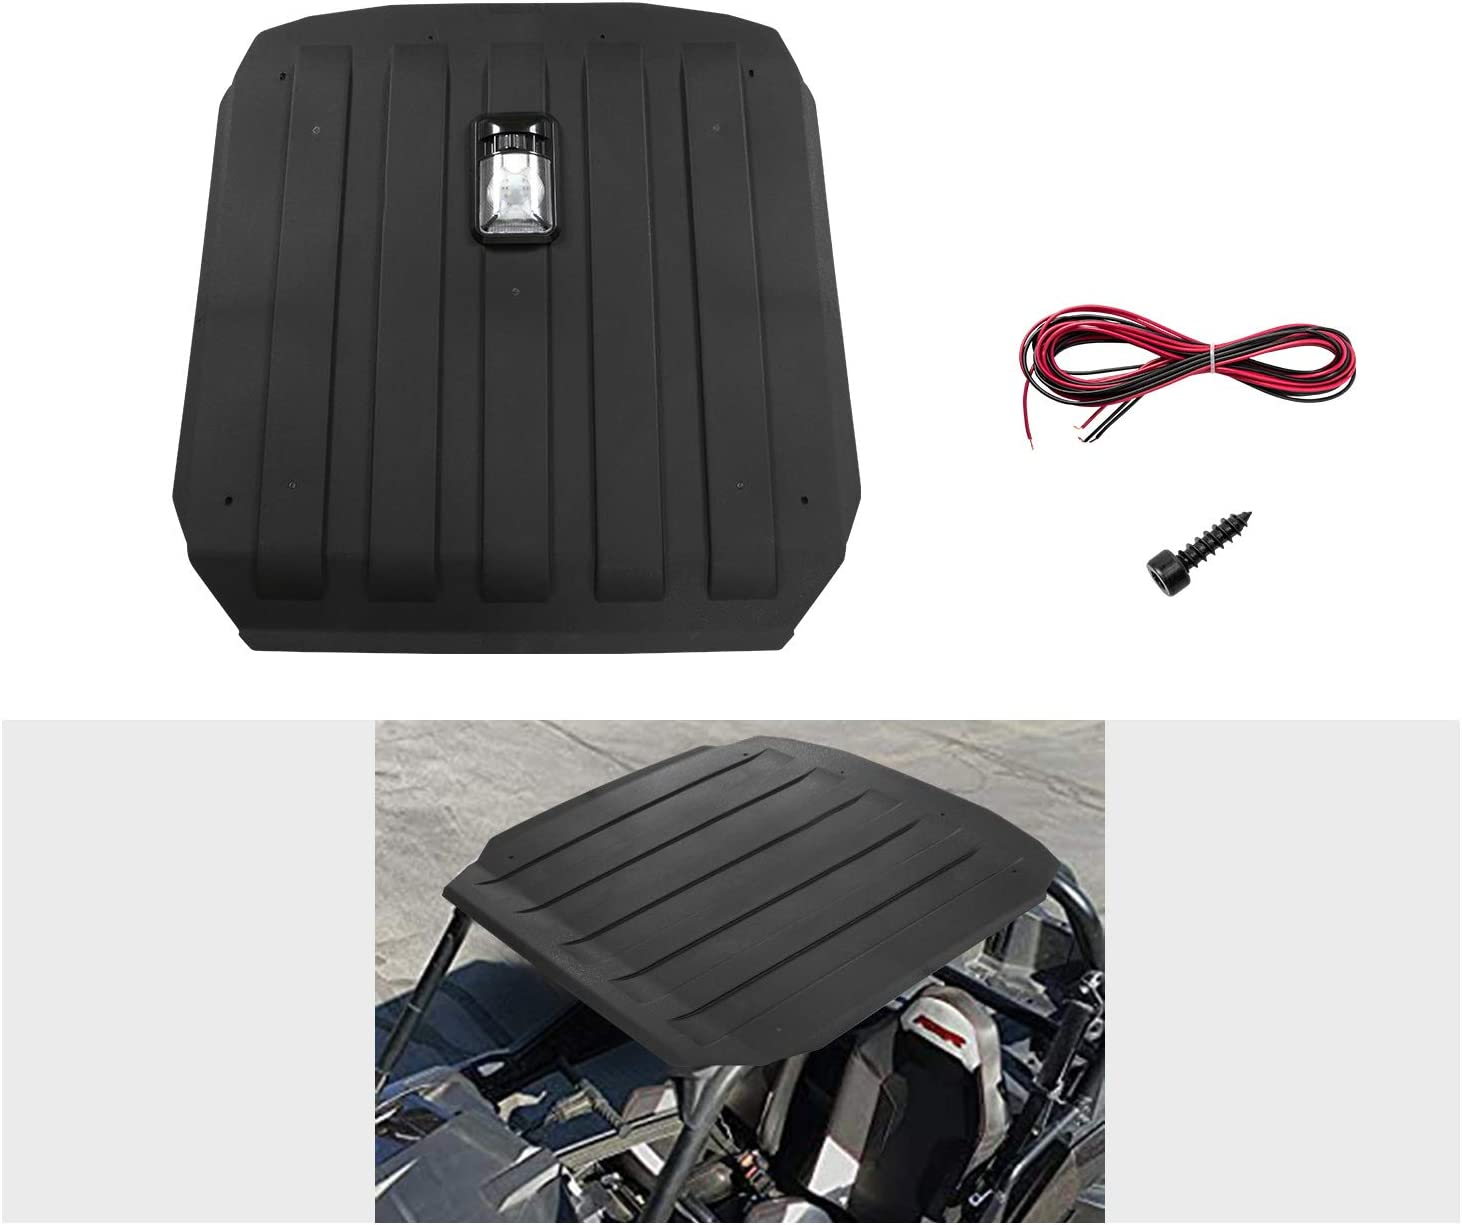 UTV Hard Top Roof A/&UTV PRO Plastic RZR Hardtop for Polaris RZR 900 XP 1000 Turbo 900 S Trail 2 Seater 2014-2020,TPE Material Accessories